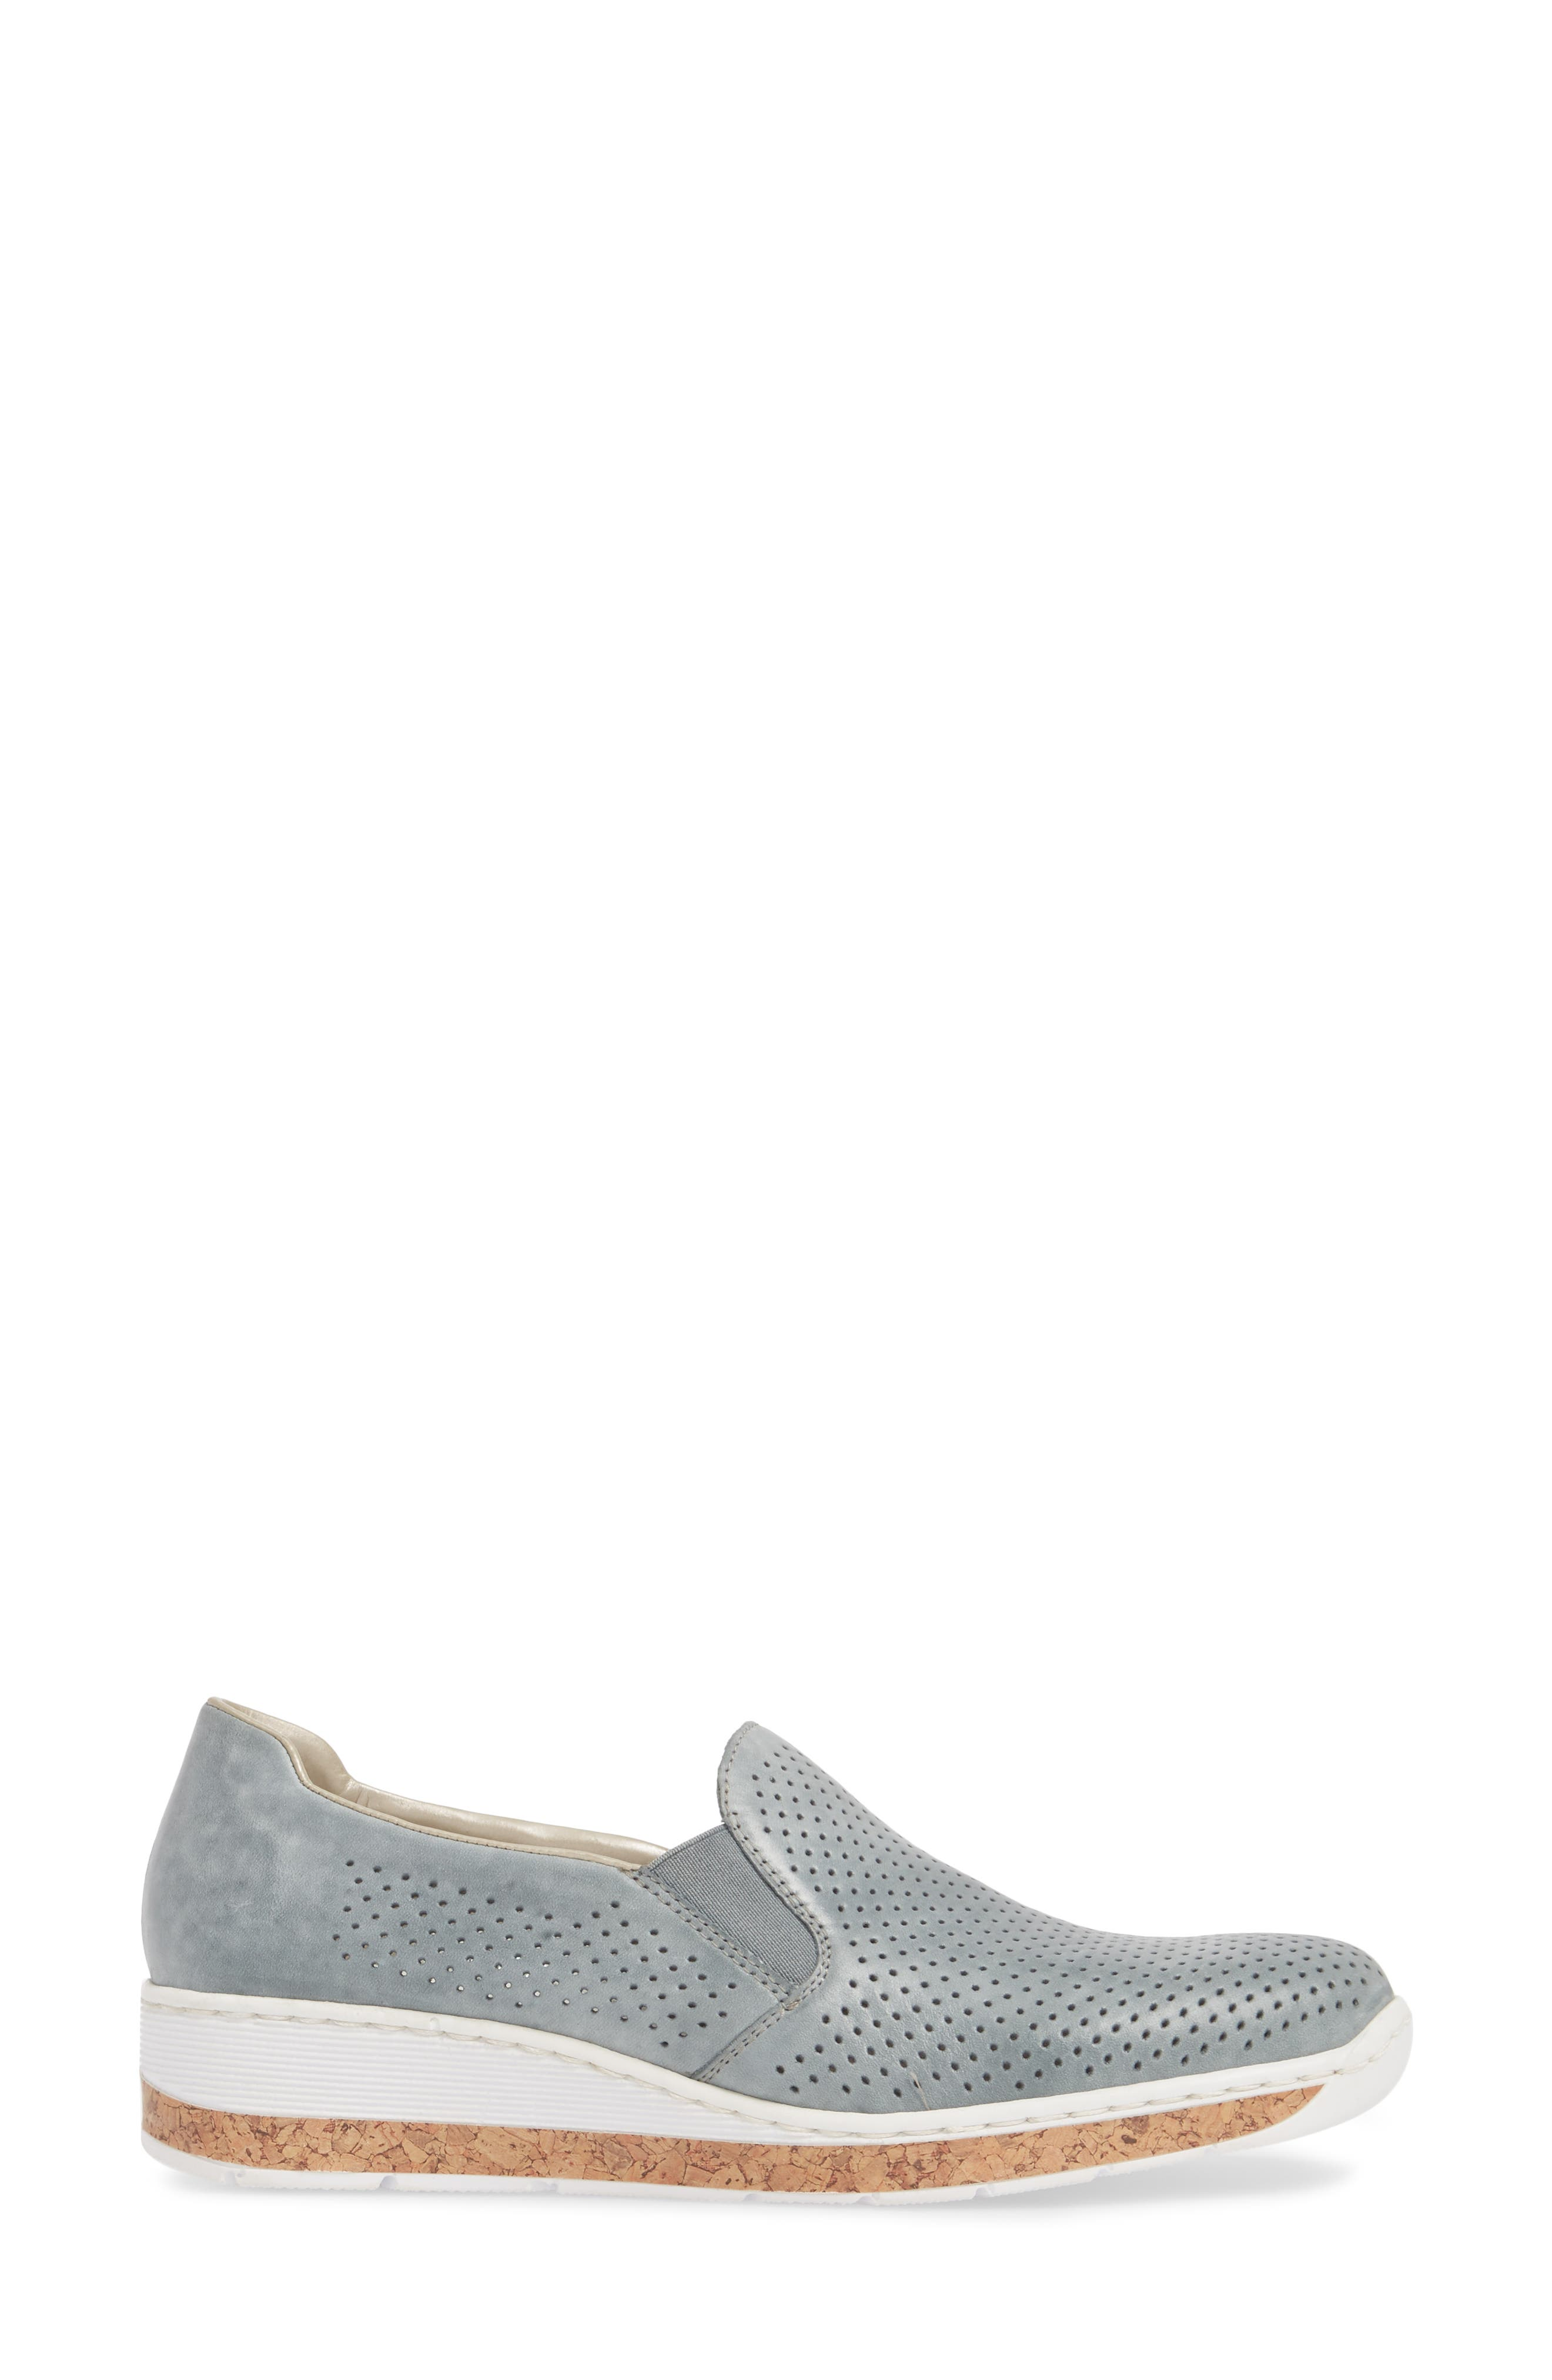 Doris 75 Wedge Sneaker,                             Alternate thumbnail 3, color,                             Royal Faux Leather